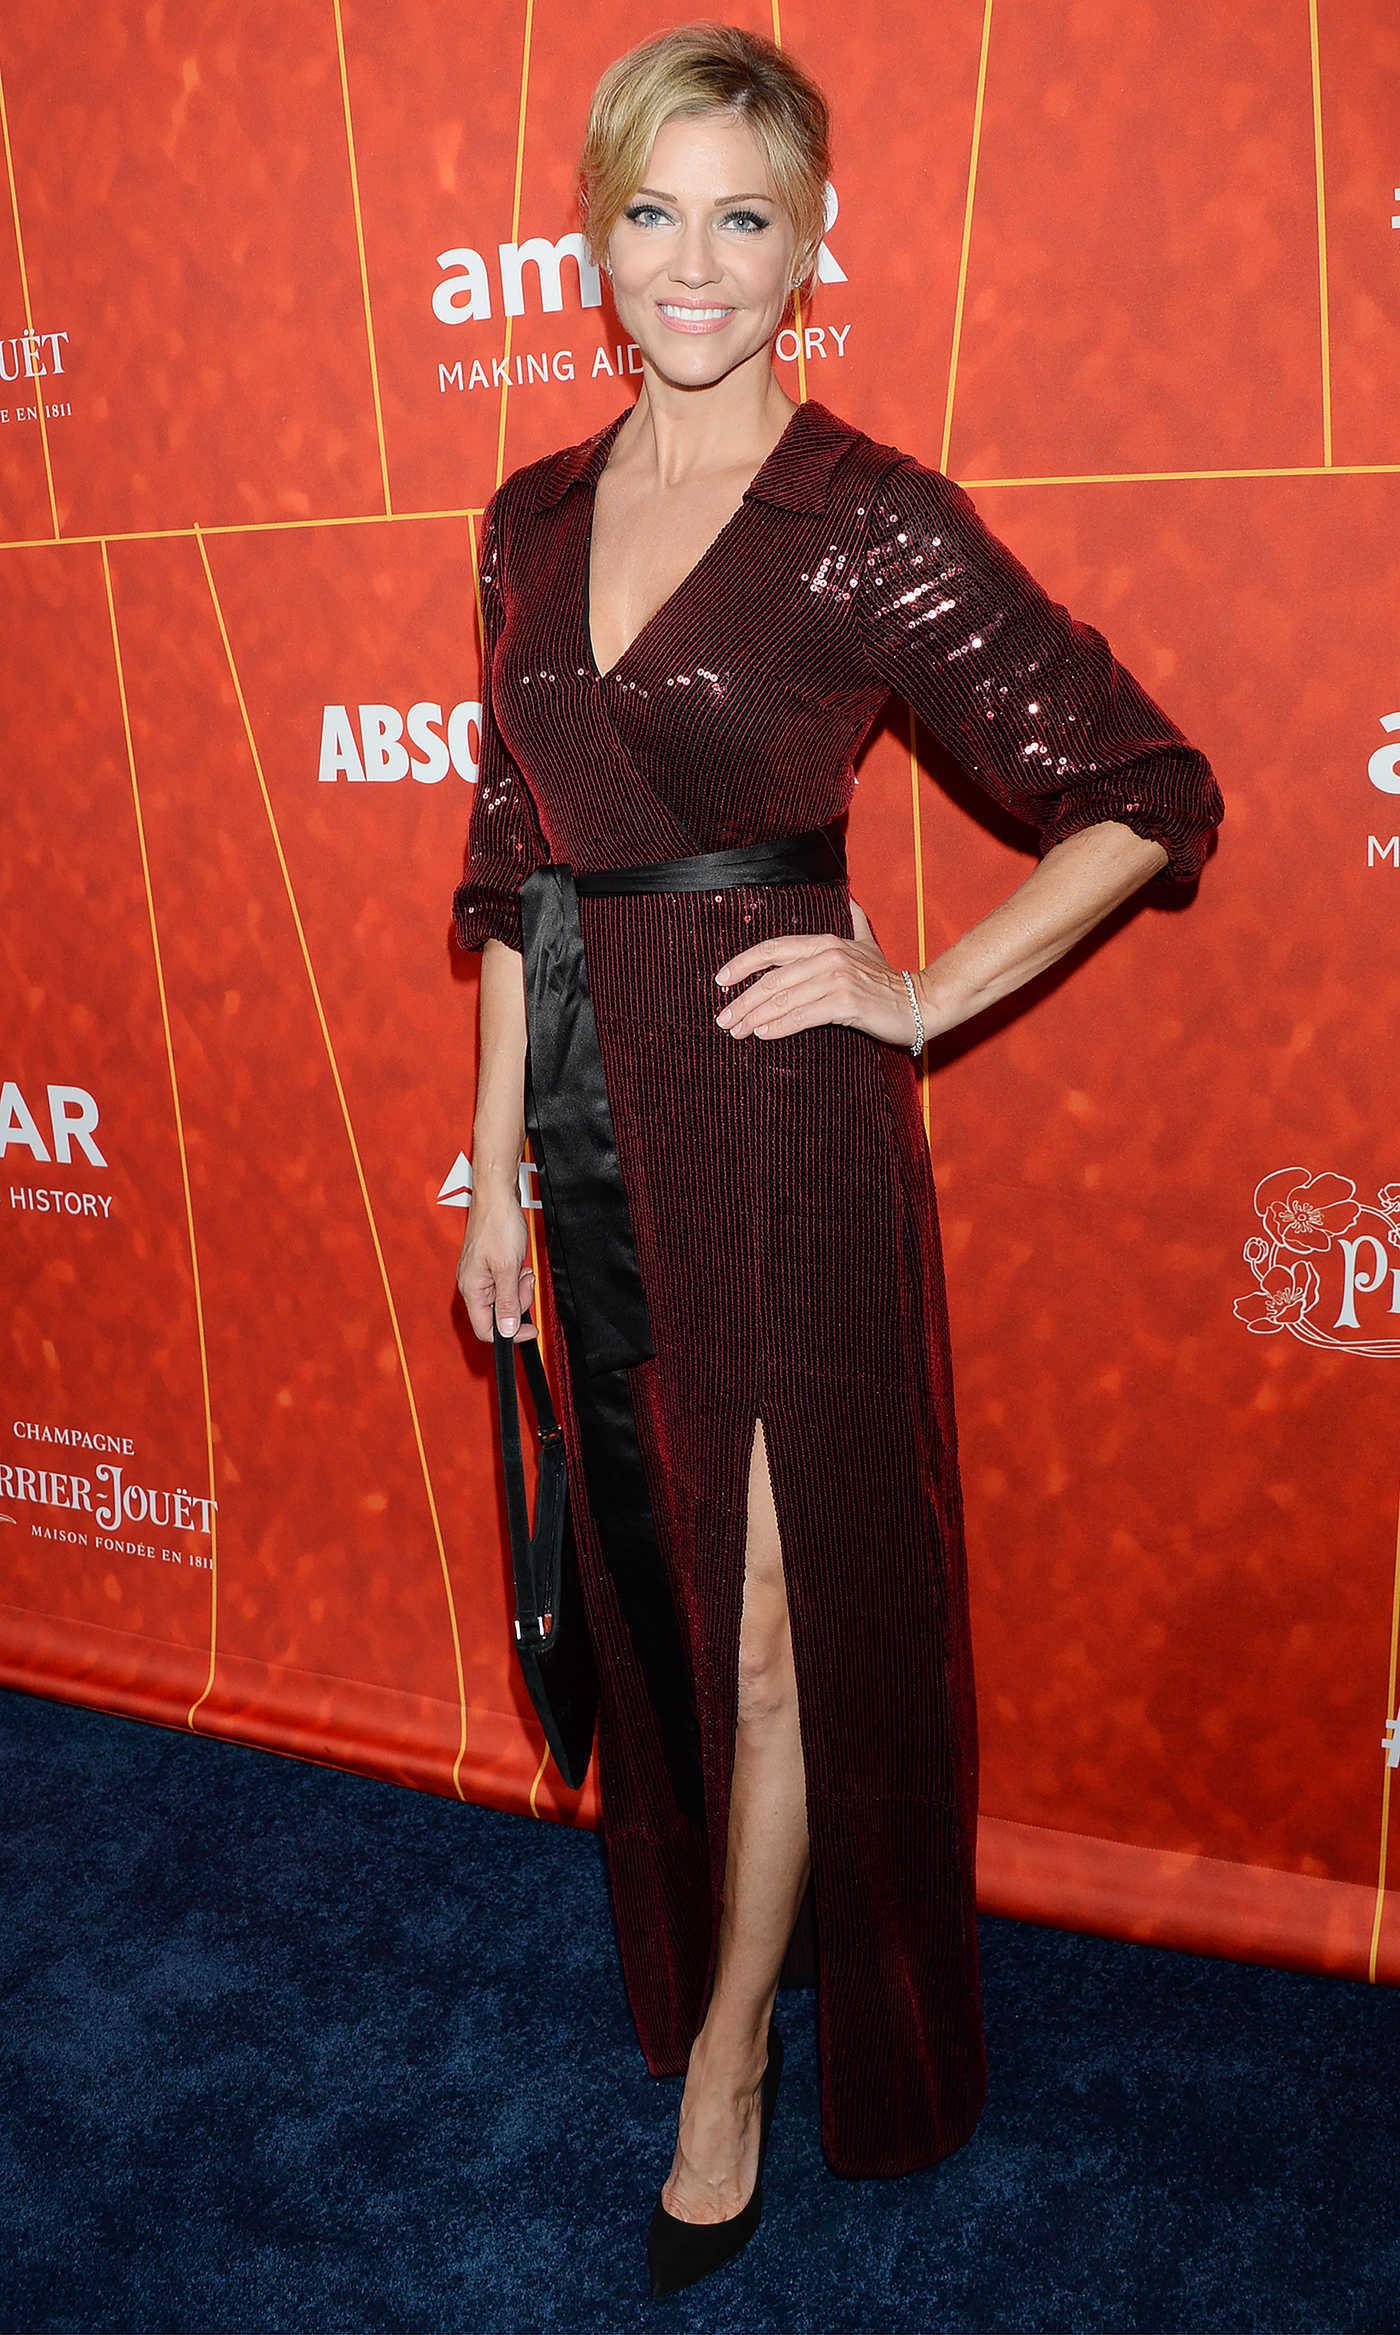 Tricia Helfer Attends amfAR Gala in Beverly Hills 10/18/2018